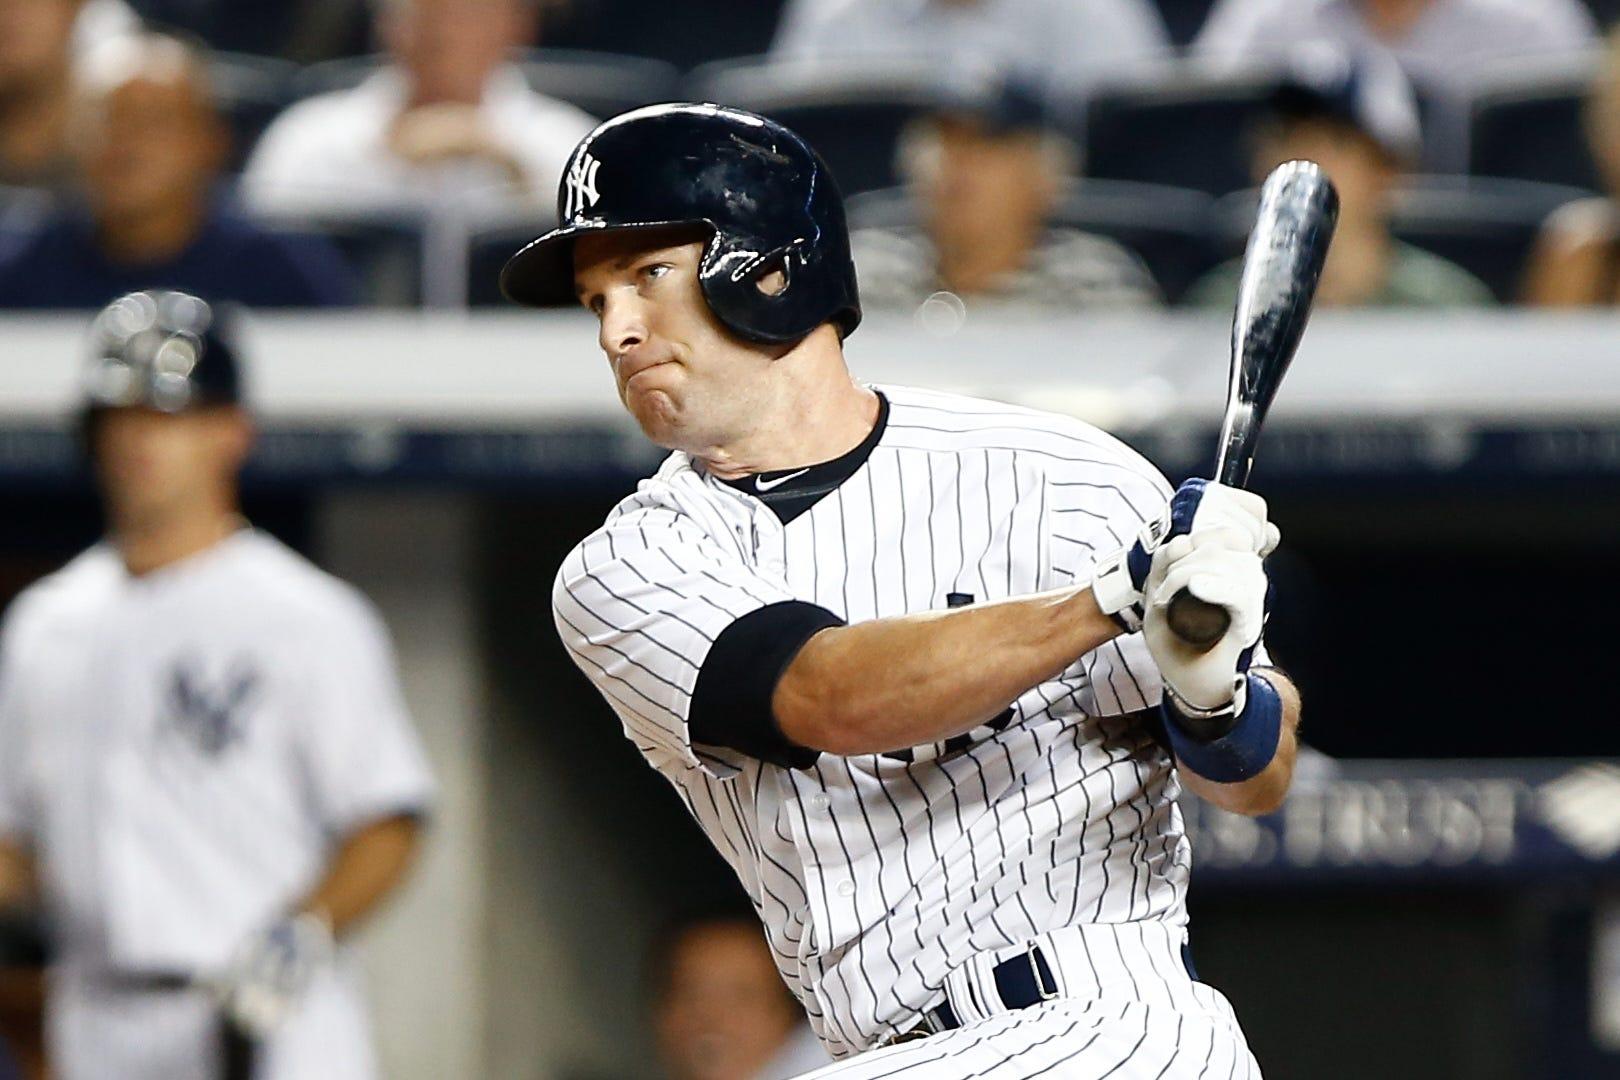 New York Yankees third baseman Jayson Nix singles in the game winning RBI against the Toronto Blue Jays during the ninth inning at Yankee Stadium.